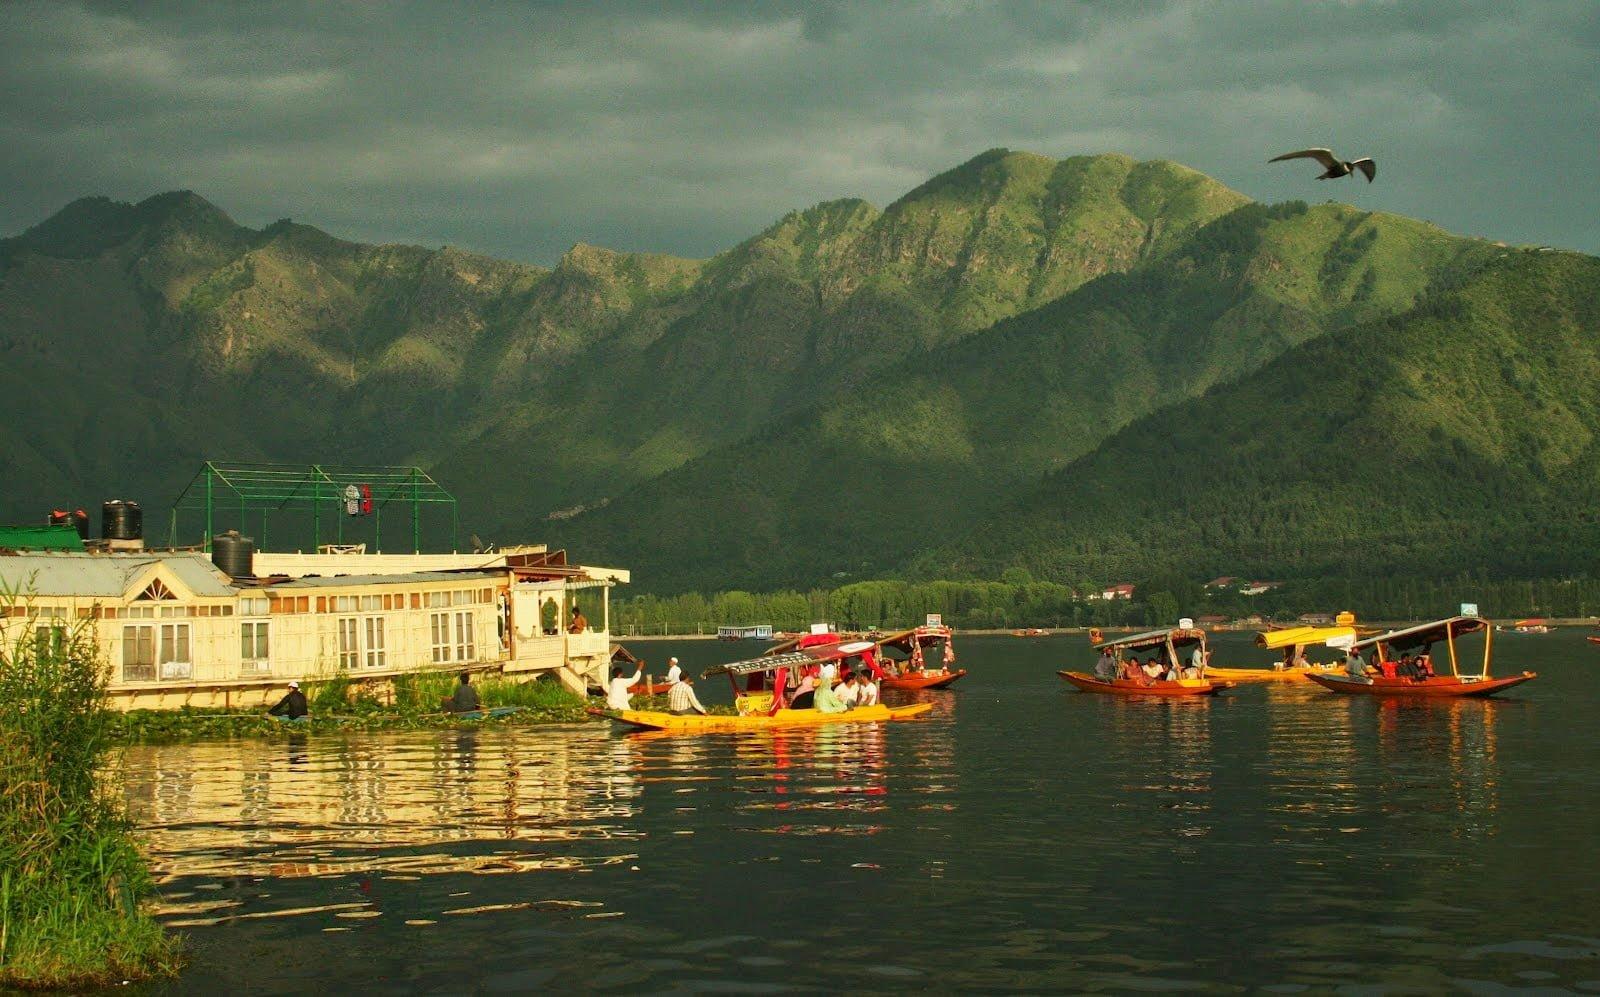 Srinagar, Jammu and Kashmir